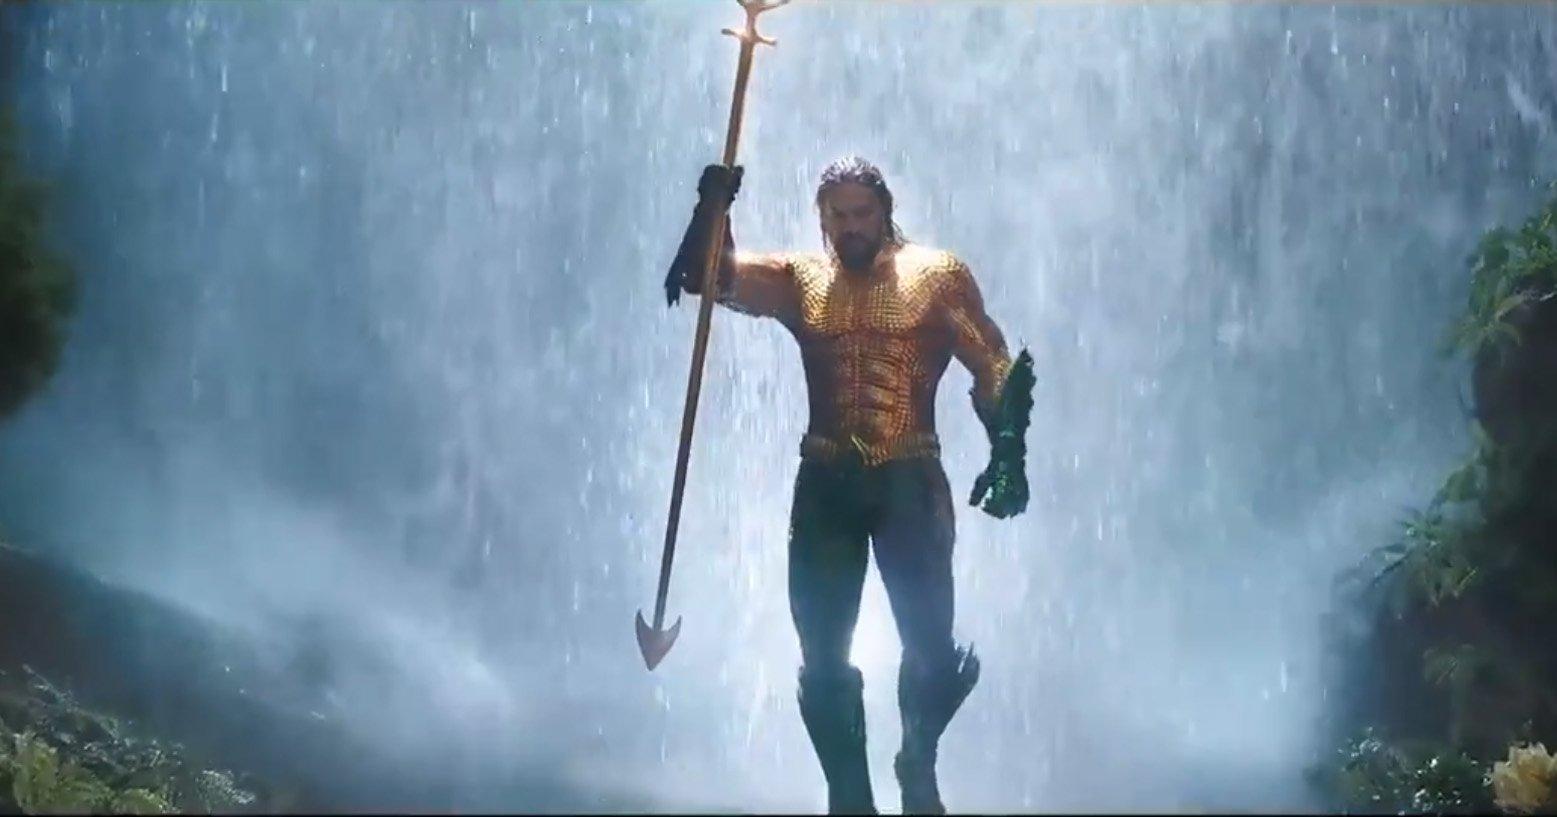 Aquaman review: Jason Momoa's superhero is flawed but a lot of fun